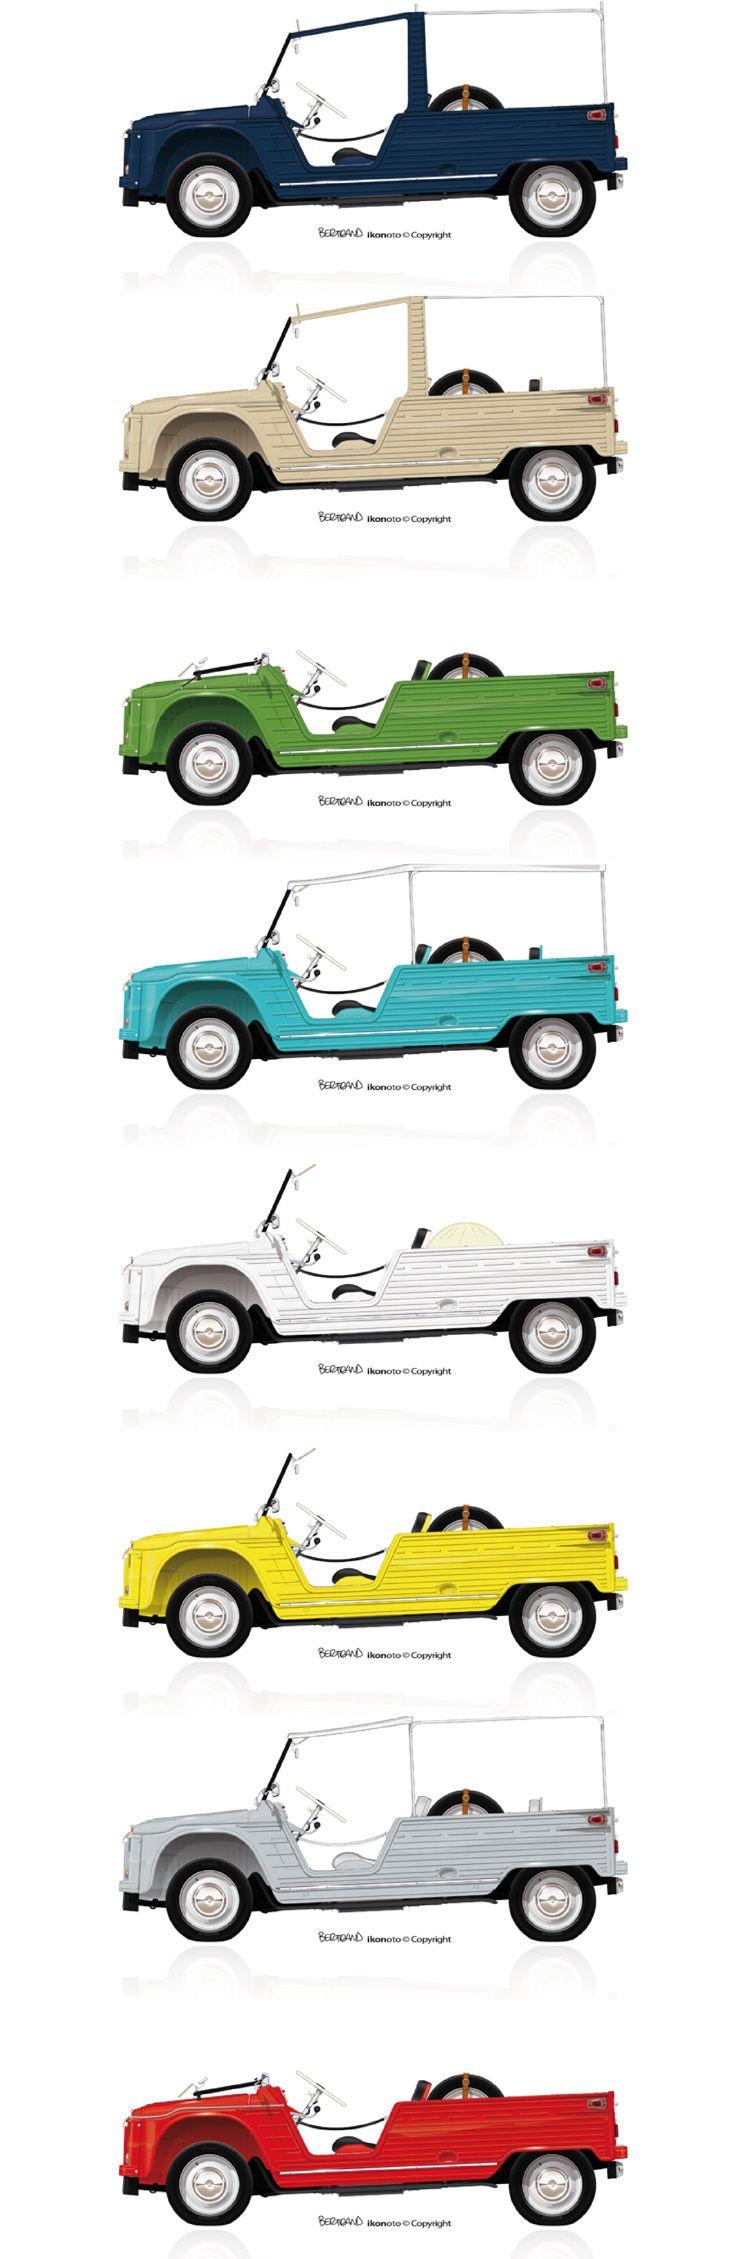 Citroen mehari blanc turquoise bleu vert jaune rouge beige pre serie deauville 1968 ikonoto - Garage mercedes deauville ...